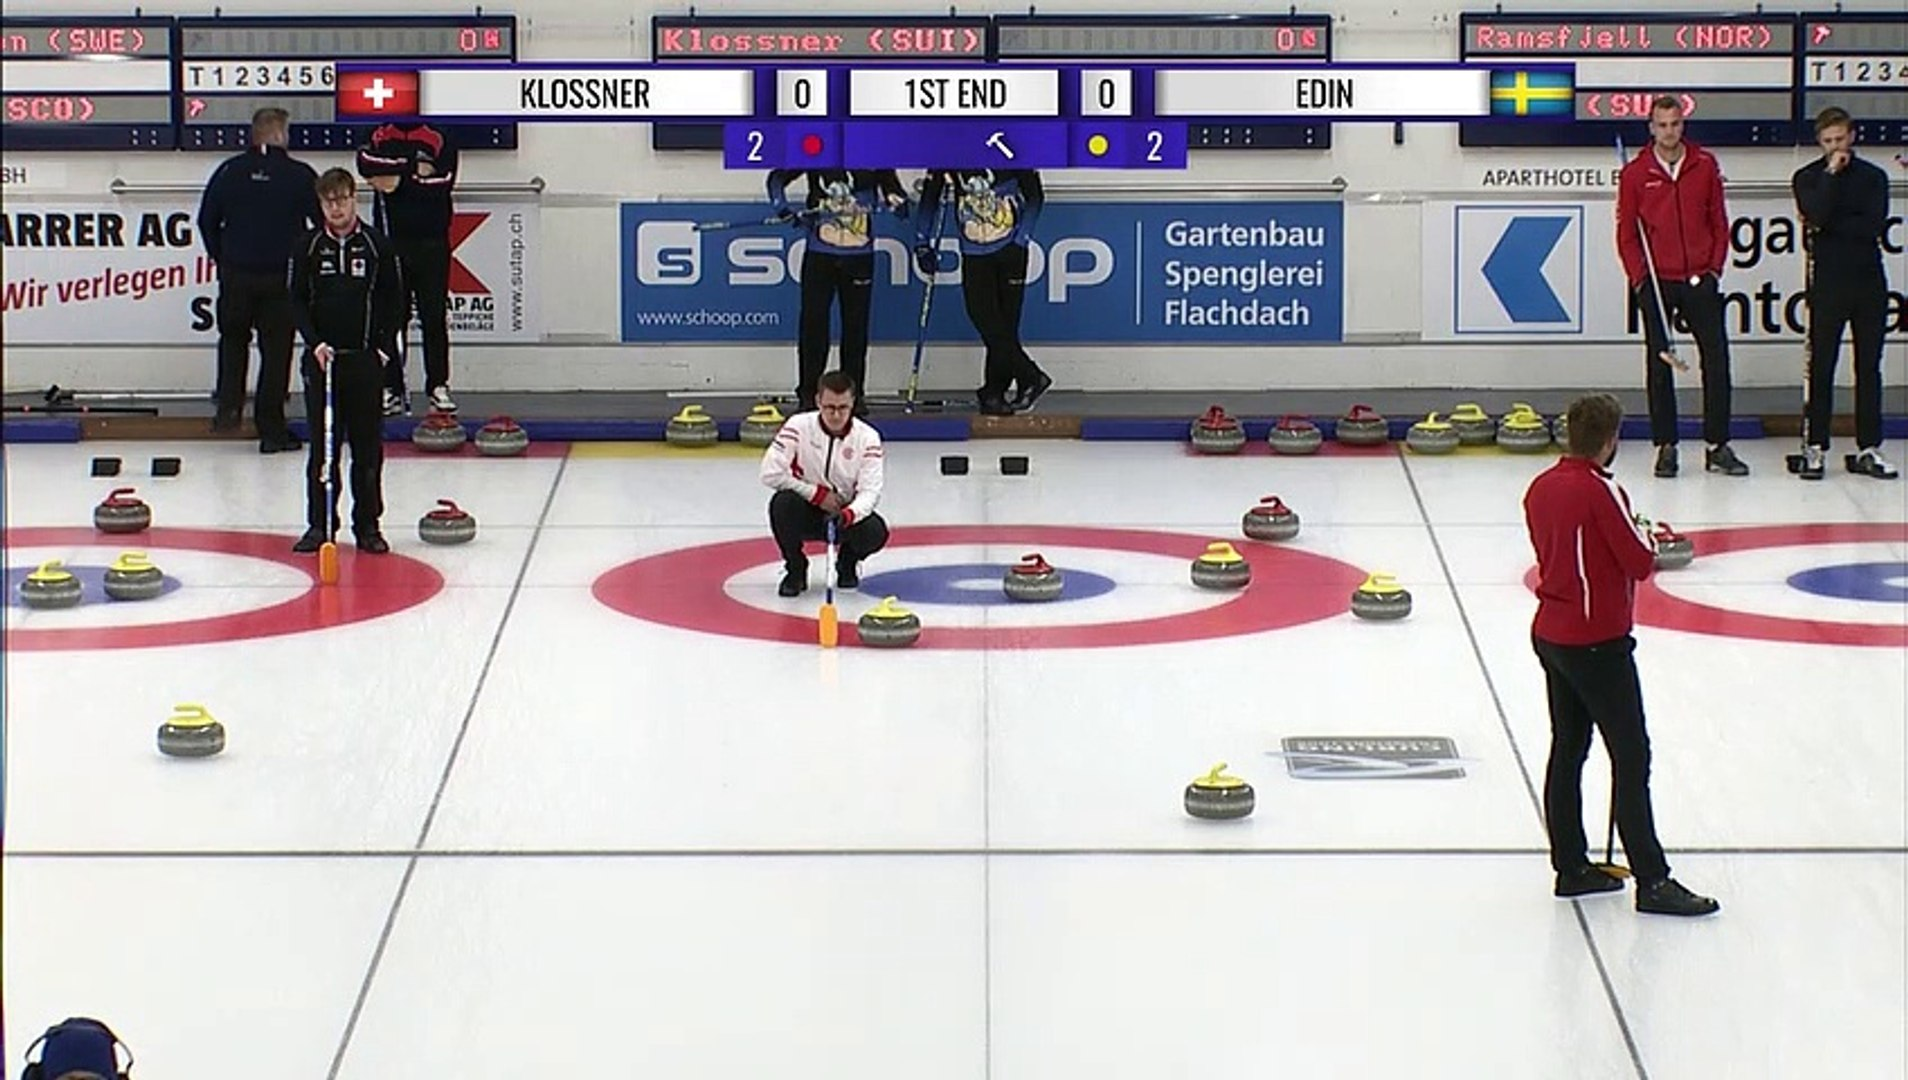 World Curling Tour, Baden Masters 2019, Team Klossner (SUI) vs Team Edin (SWE)